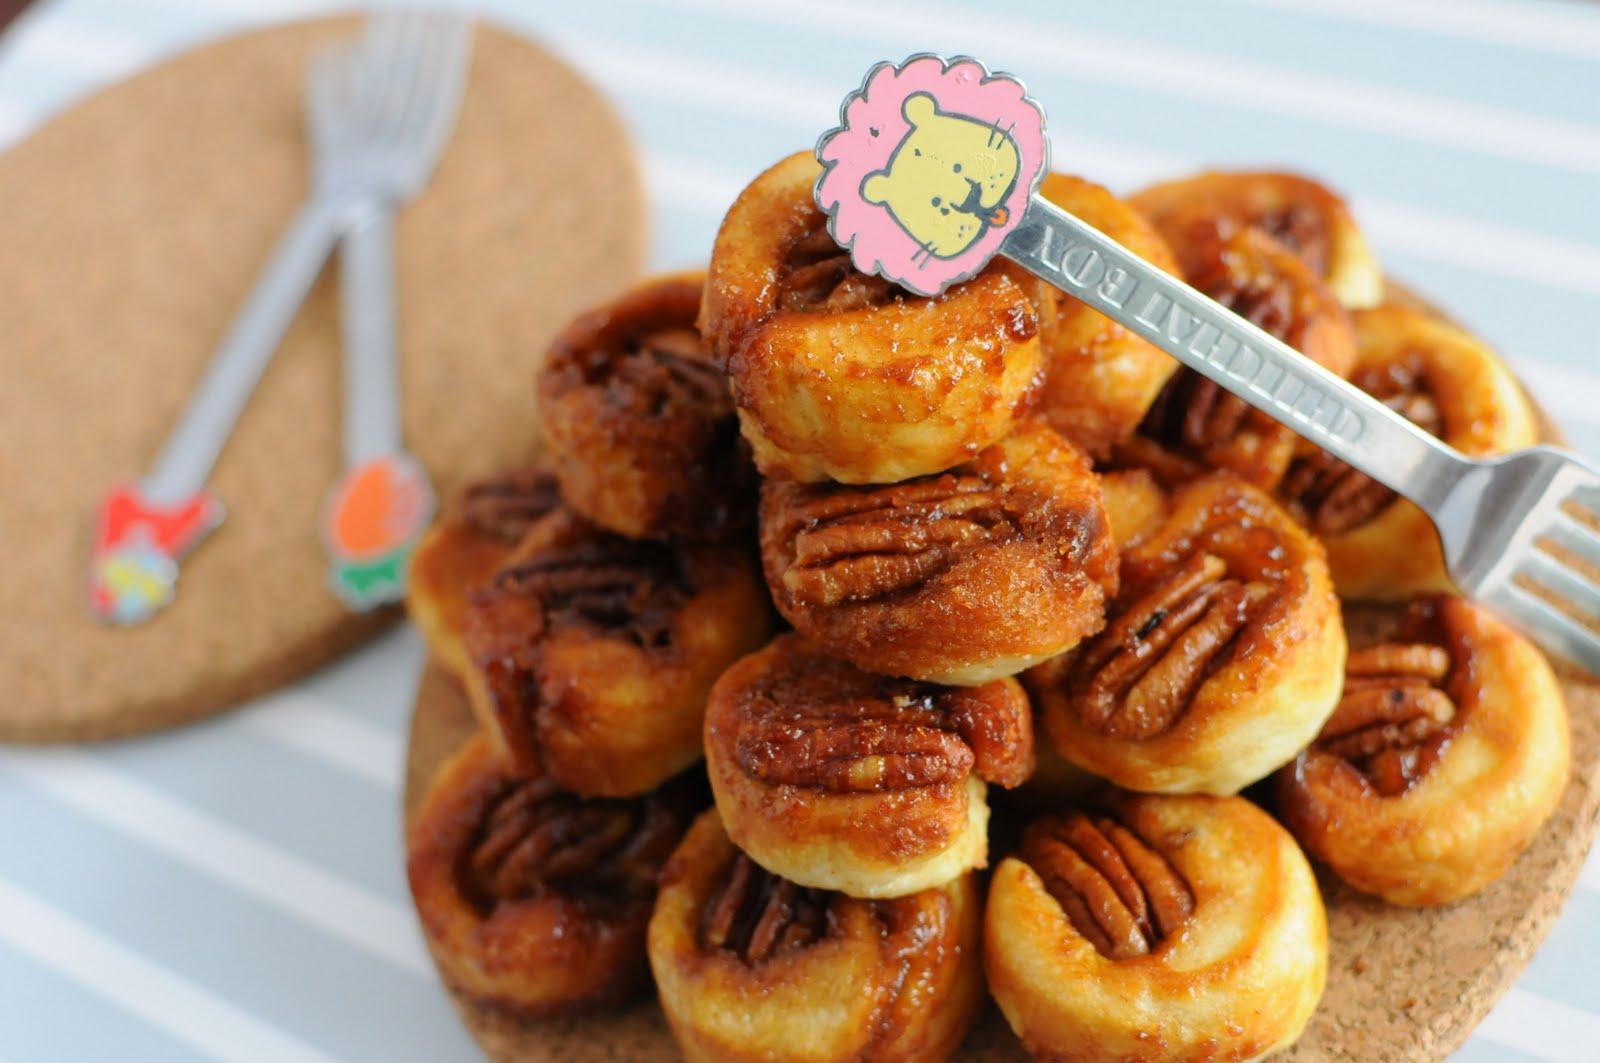 Sweet make me Smile ..: Tiny Sticky Pecan Bites